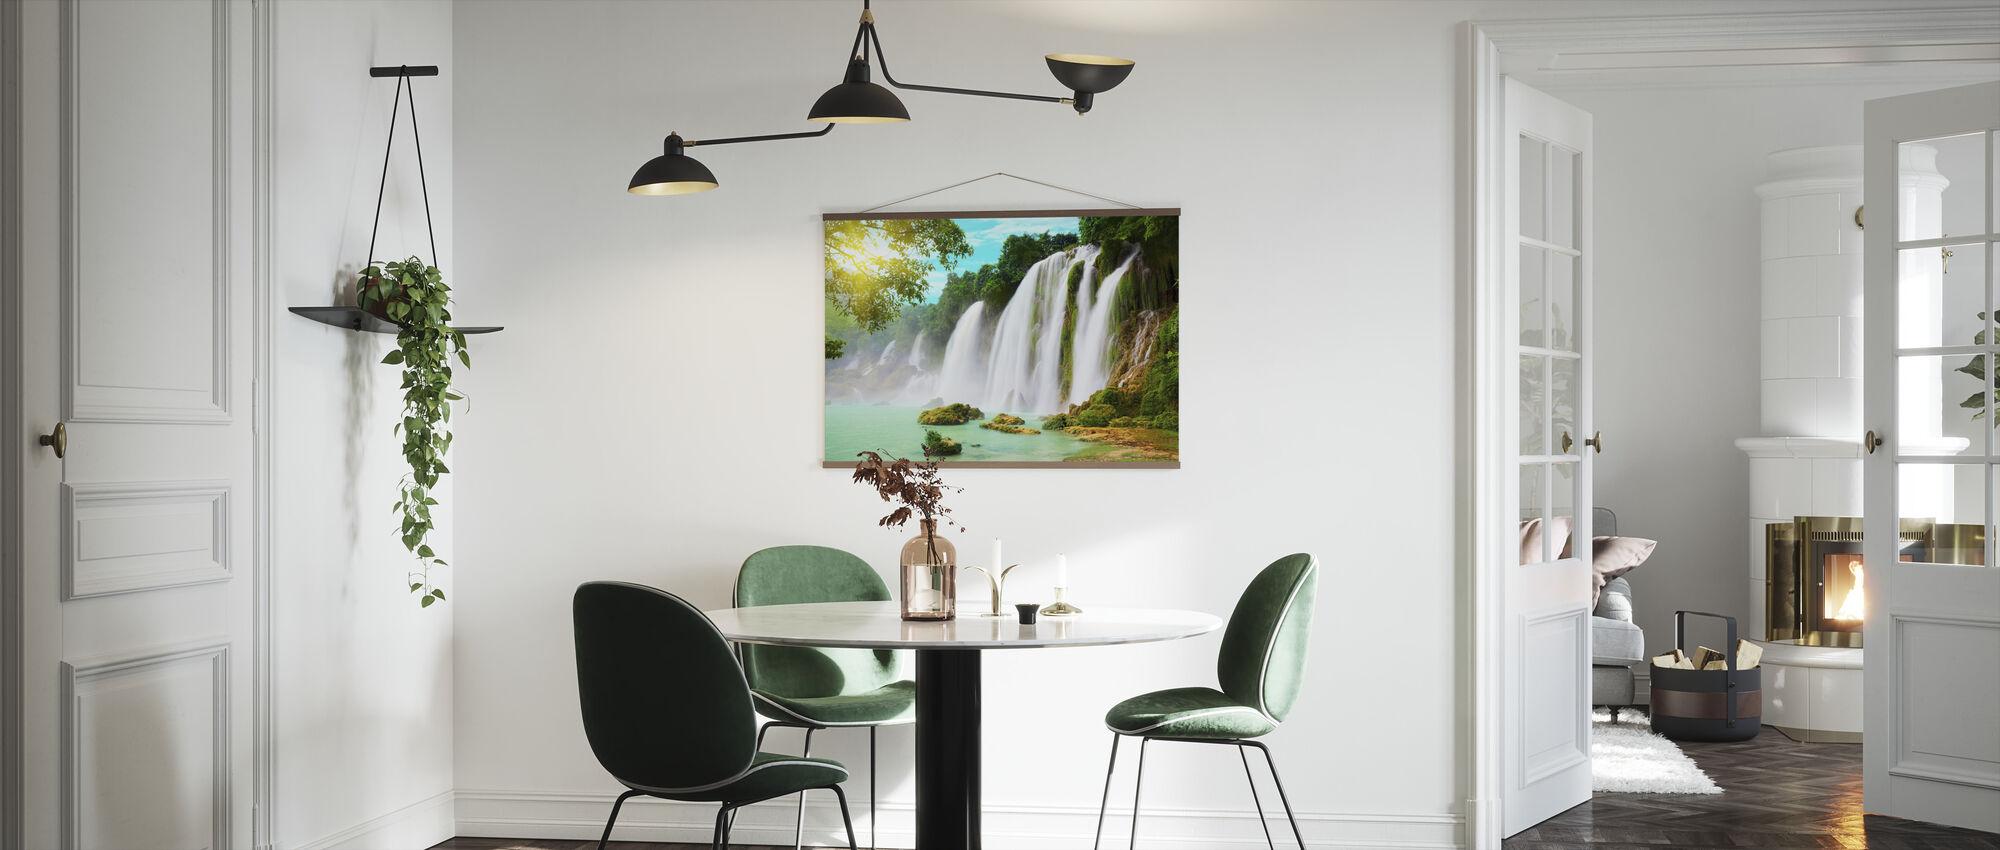 Detian Waterfall - Poster - Kitchen